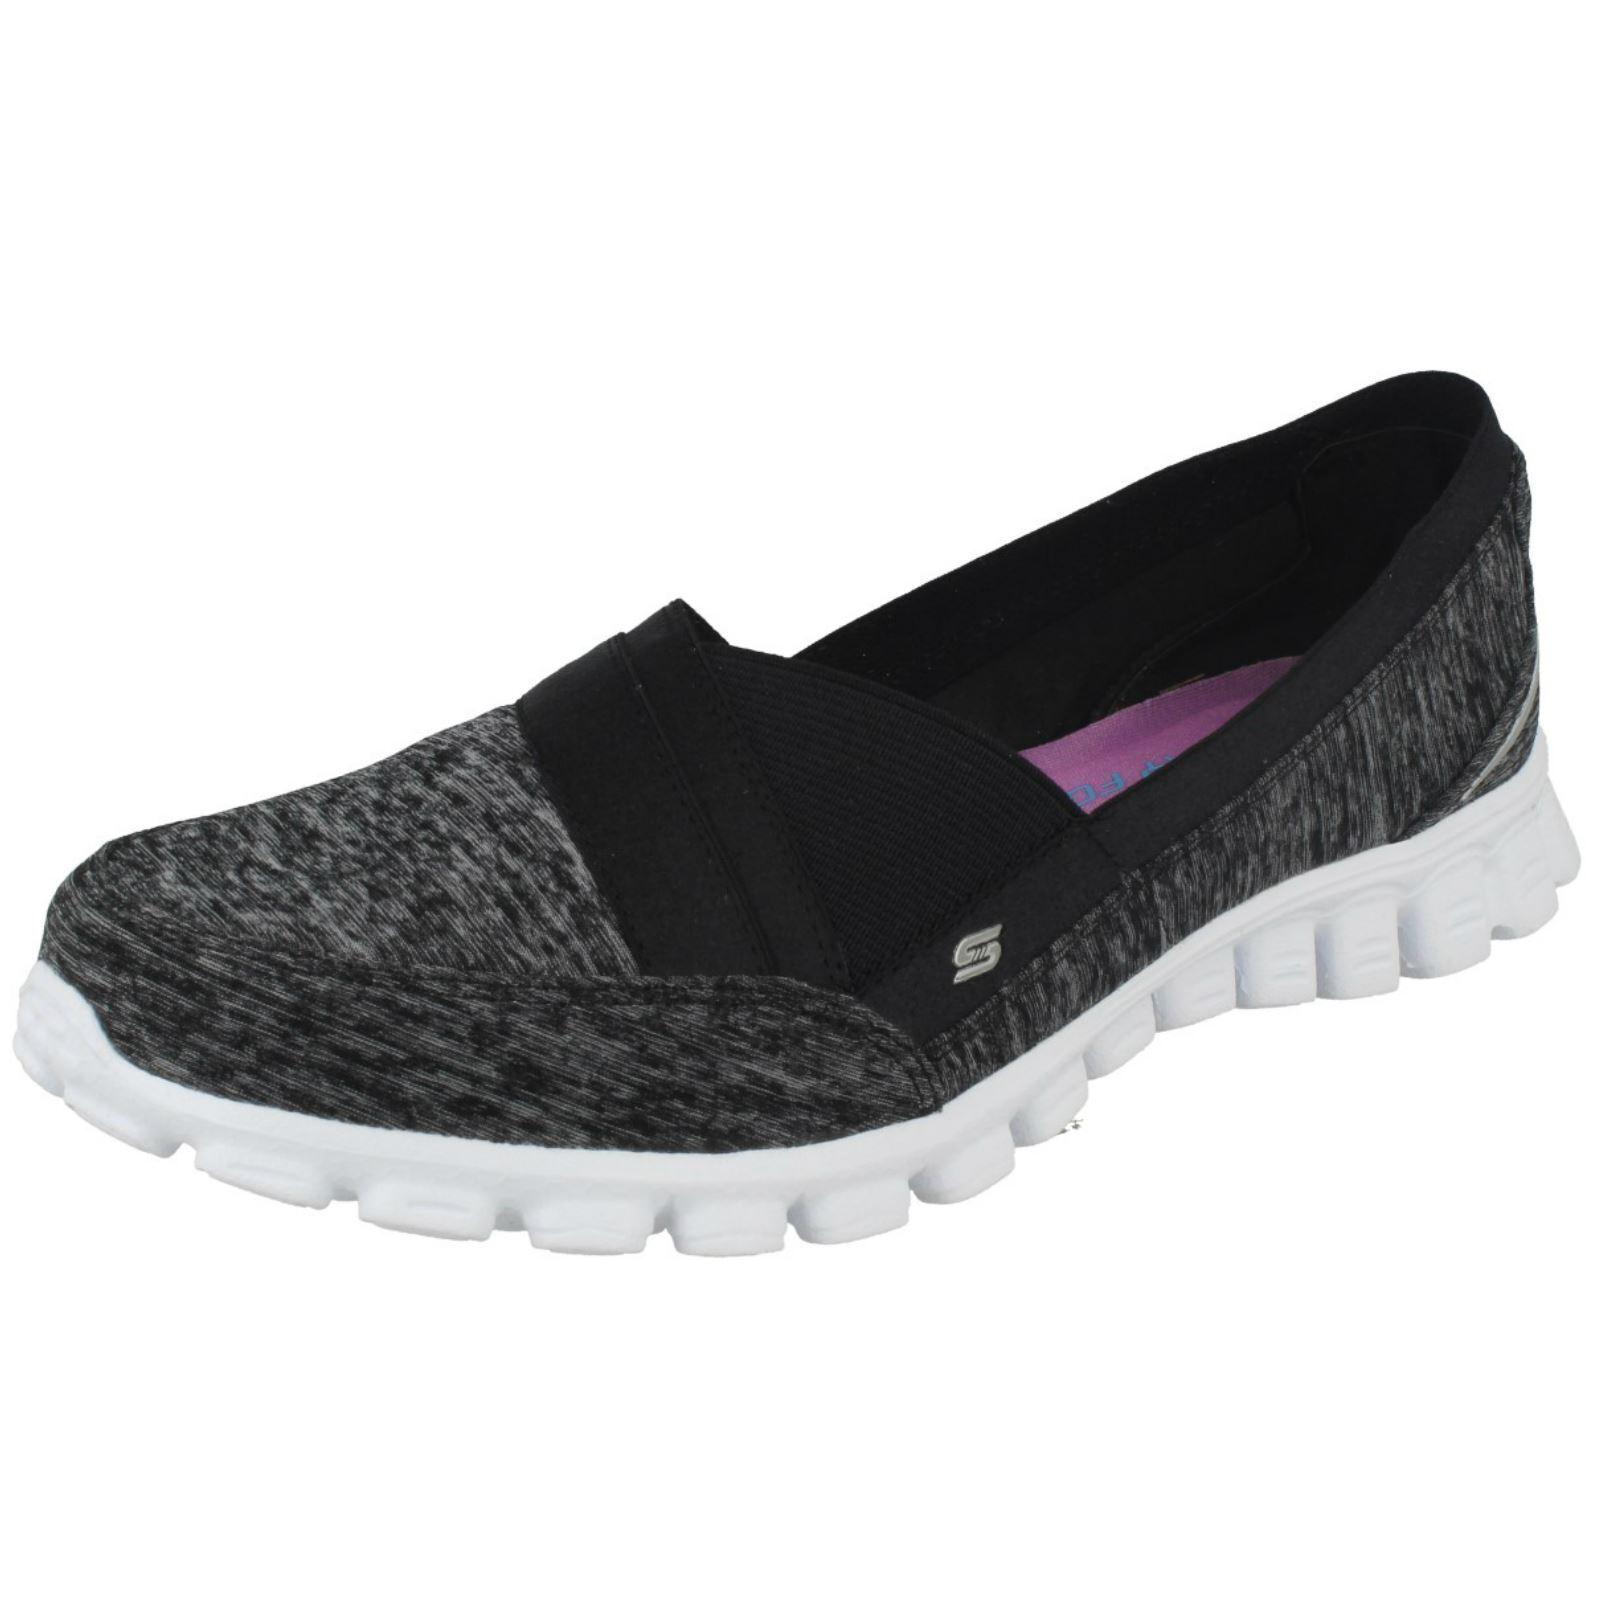 LADIES SKECHERS CASUAL LIGHTWEIGHT TRAINERS EZ Schuhe FLEX 2 FASCINATION 22827 Schuhe EZ 31de44